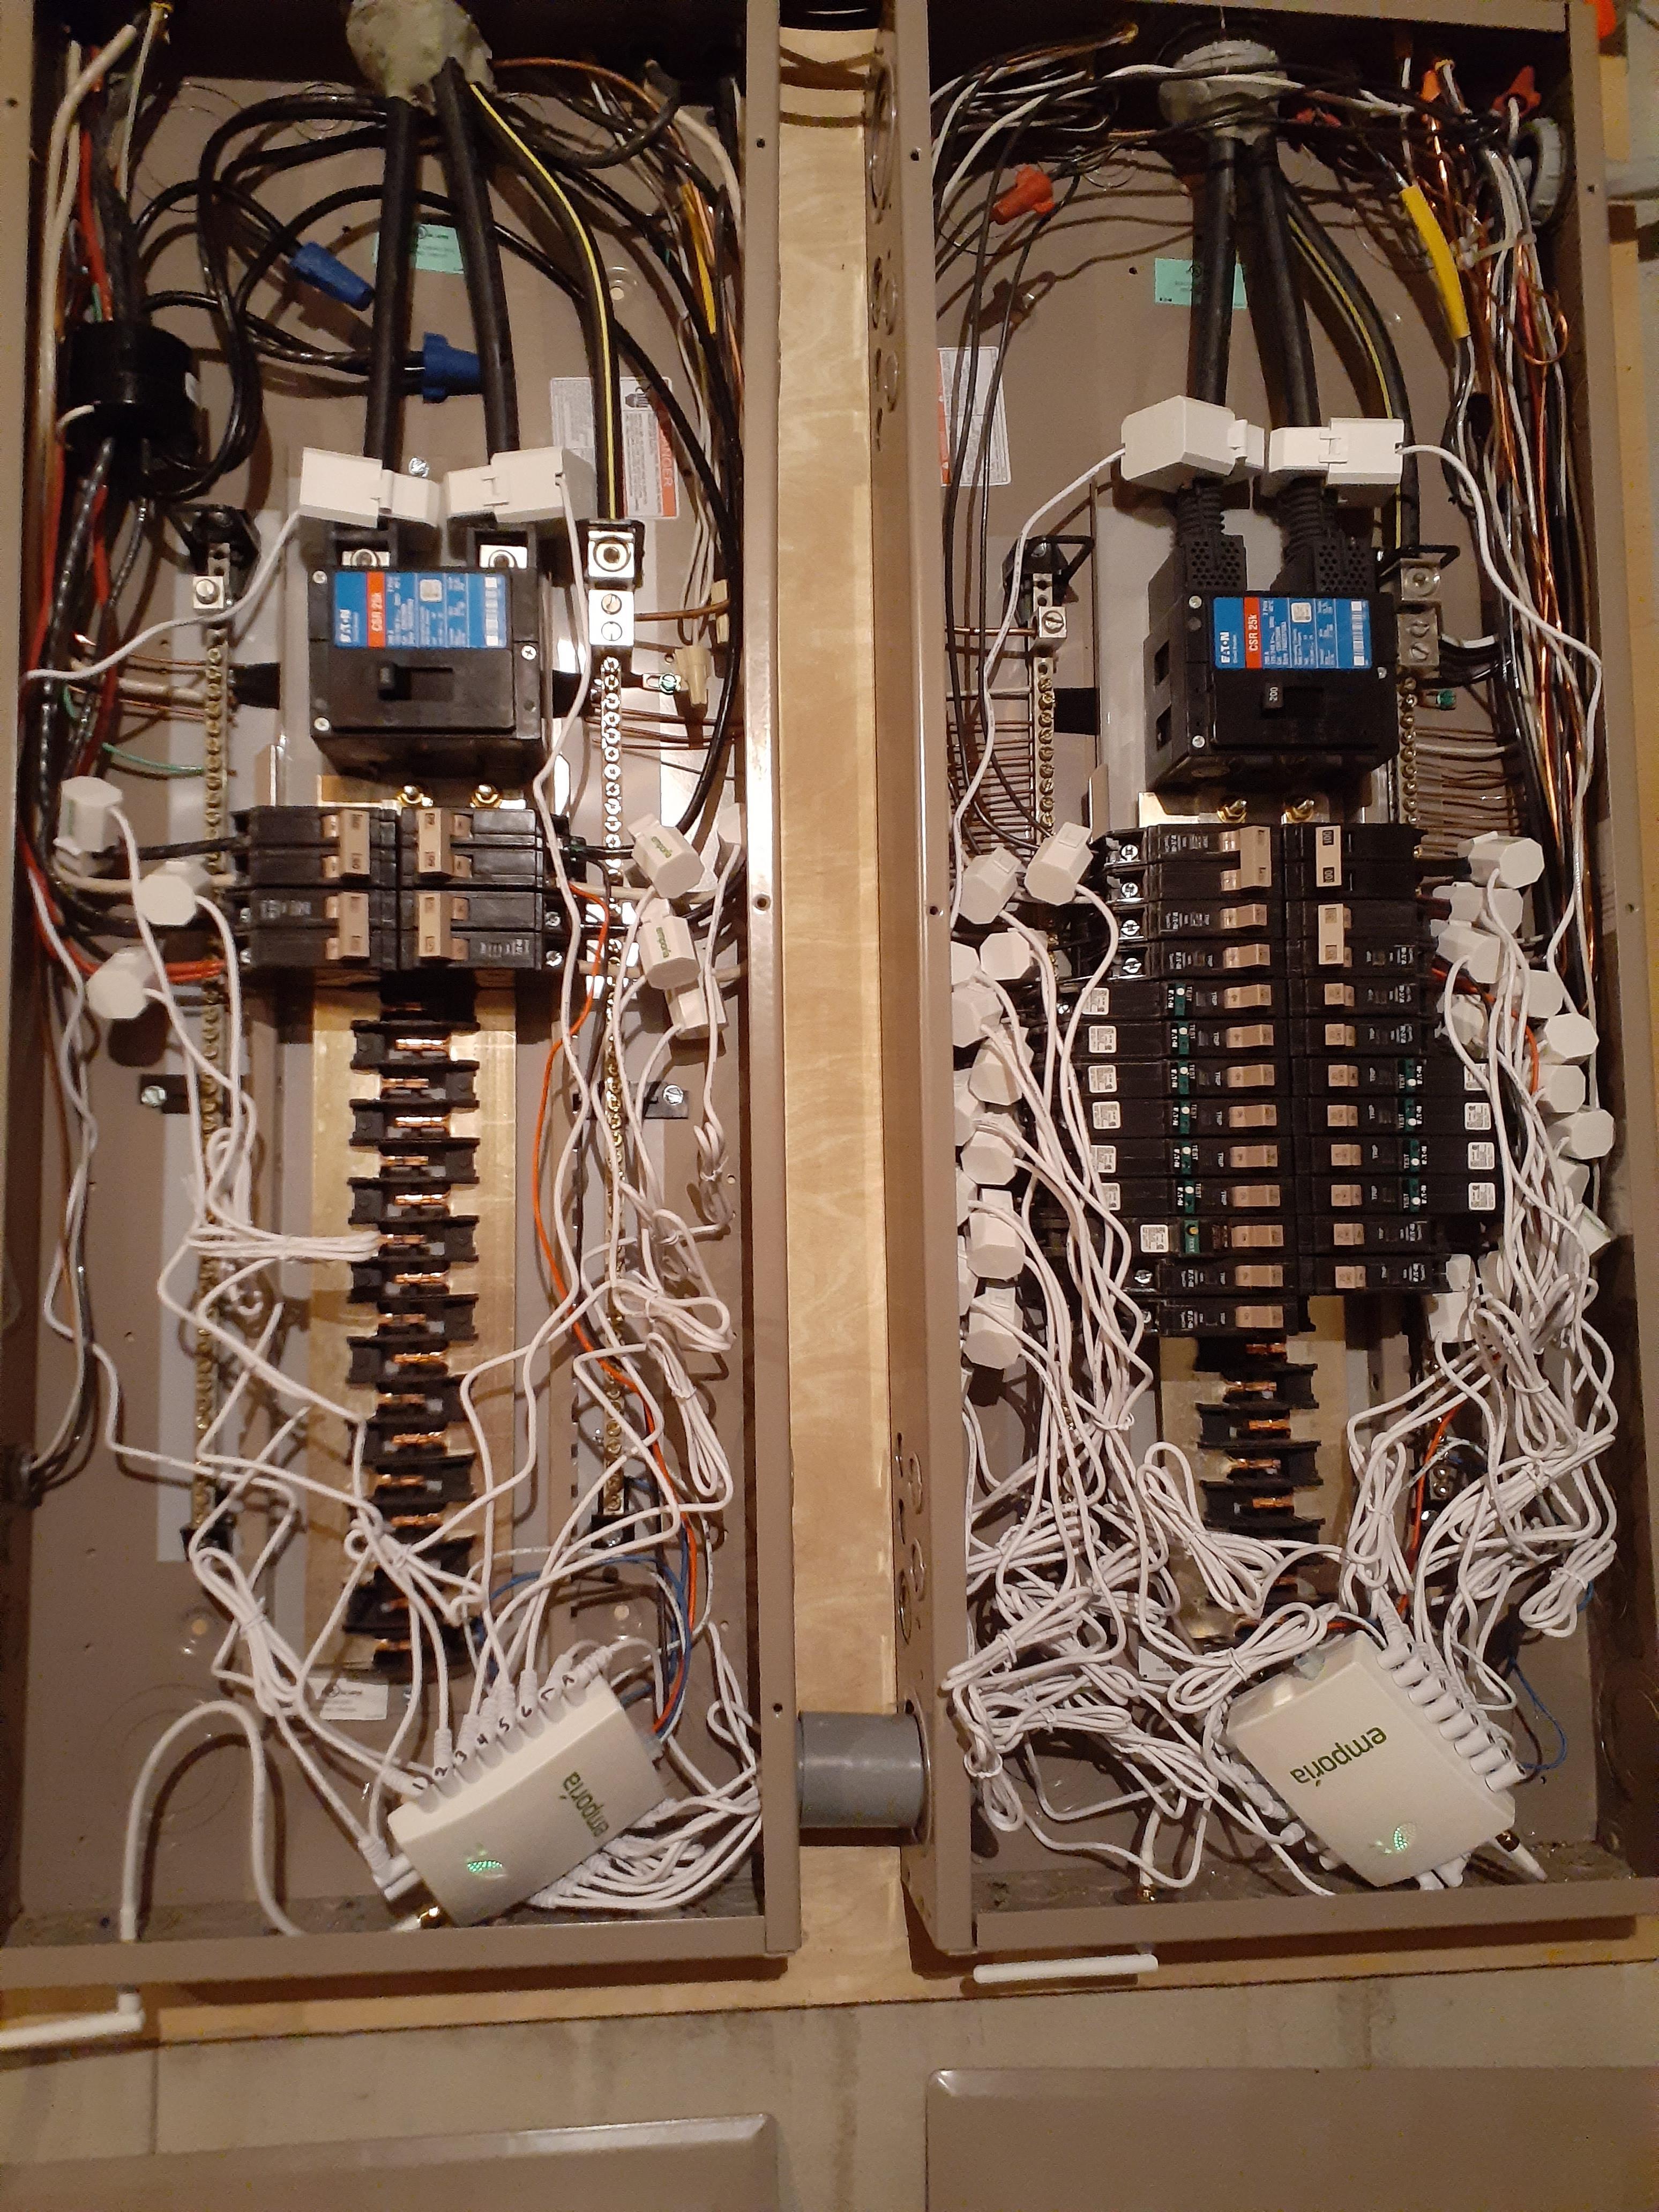 2 vue2s 2 200amp mains & 35 circuits